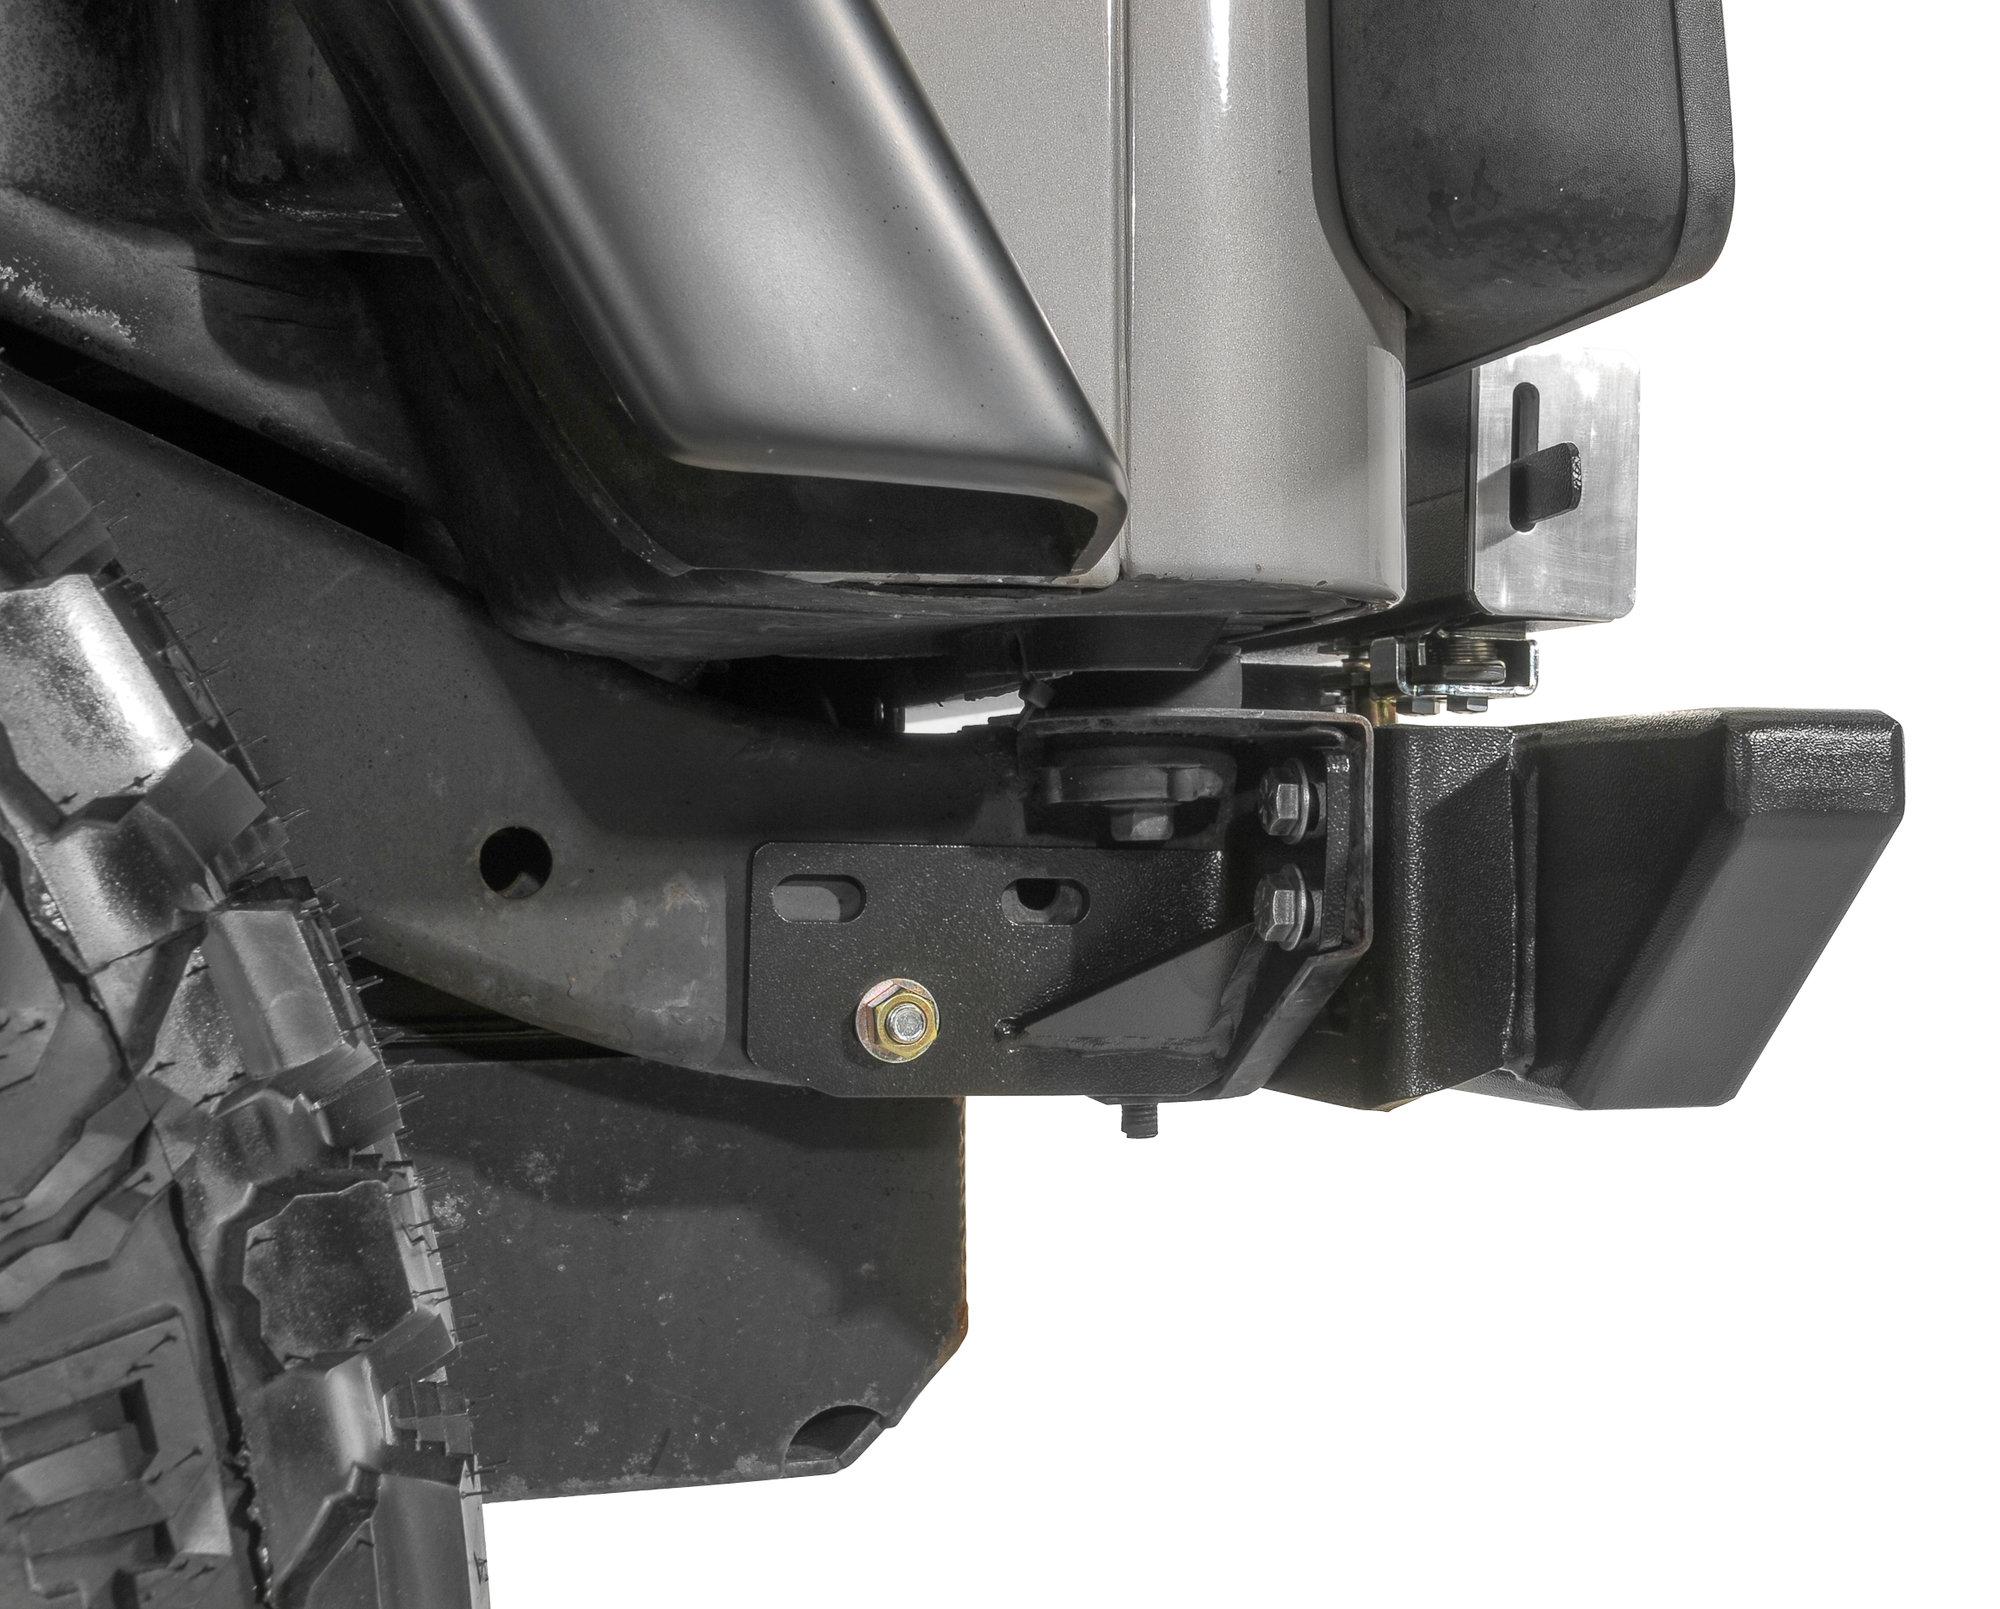 hight resolution of rock hard 4x4 rh2001 cj rear bumper heavy duty frame kit for 76 86 jeep cj quadratec